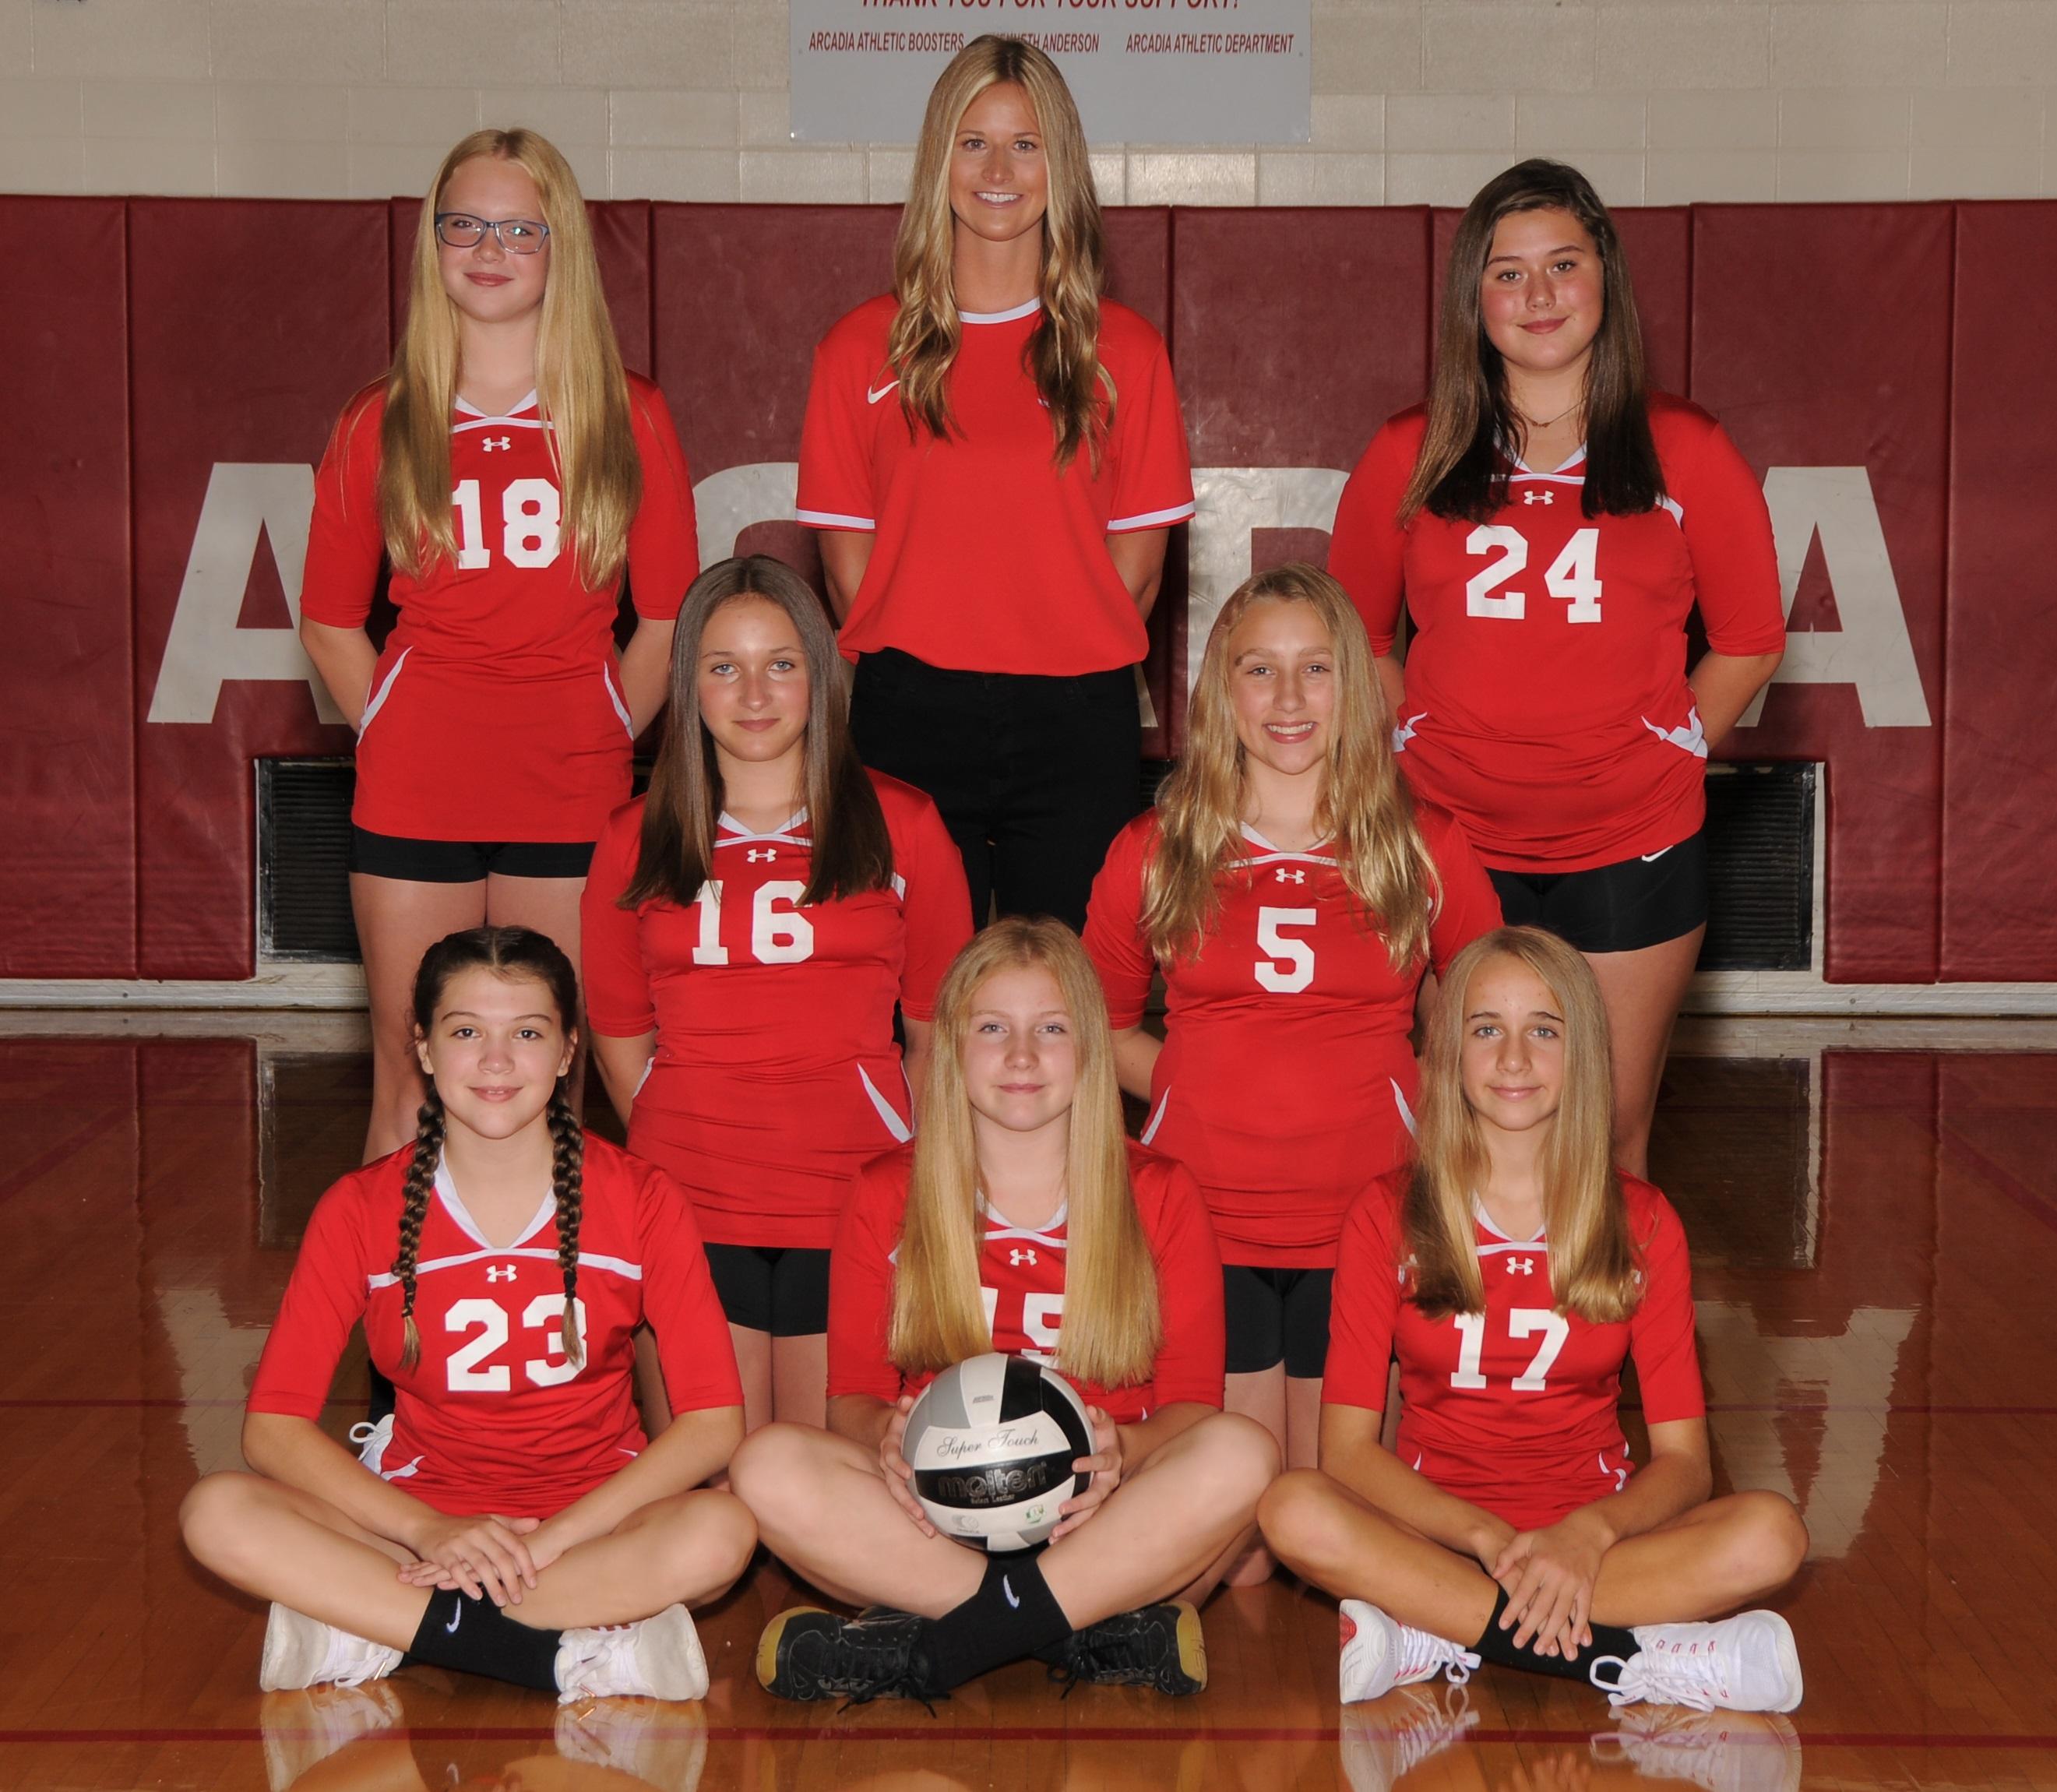 Arcadia Redskins 2020 7th Grade Volleyball Team Photo